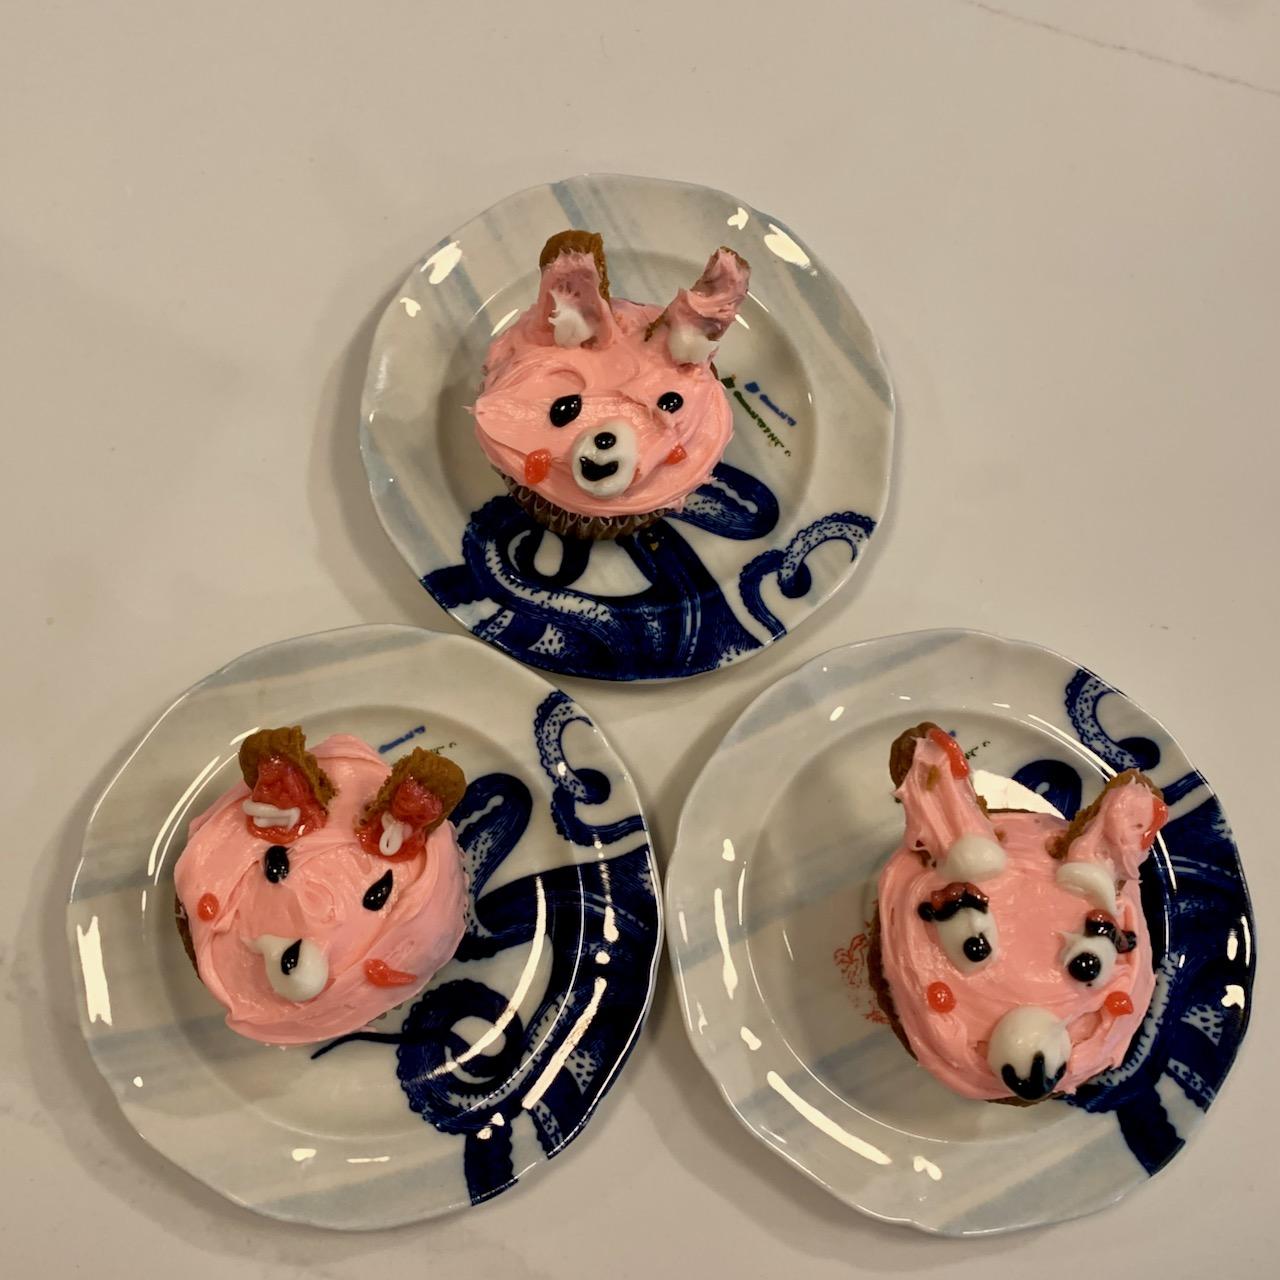 Cupcakes decorated as bunnies